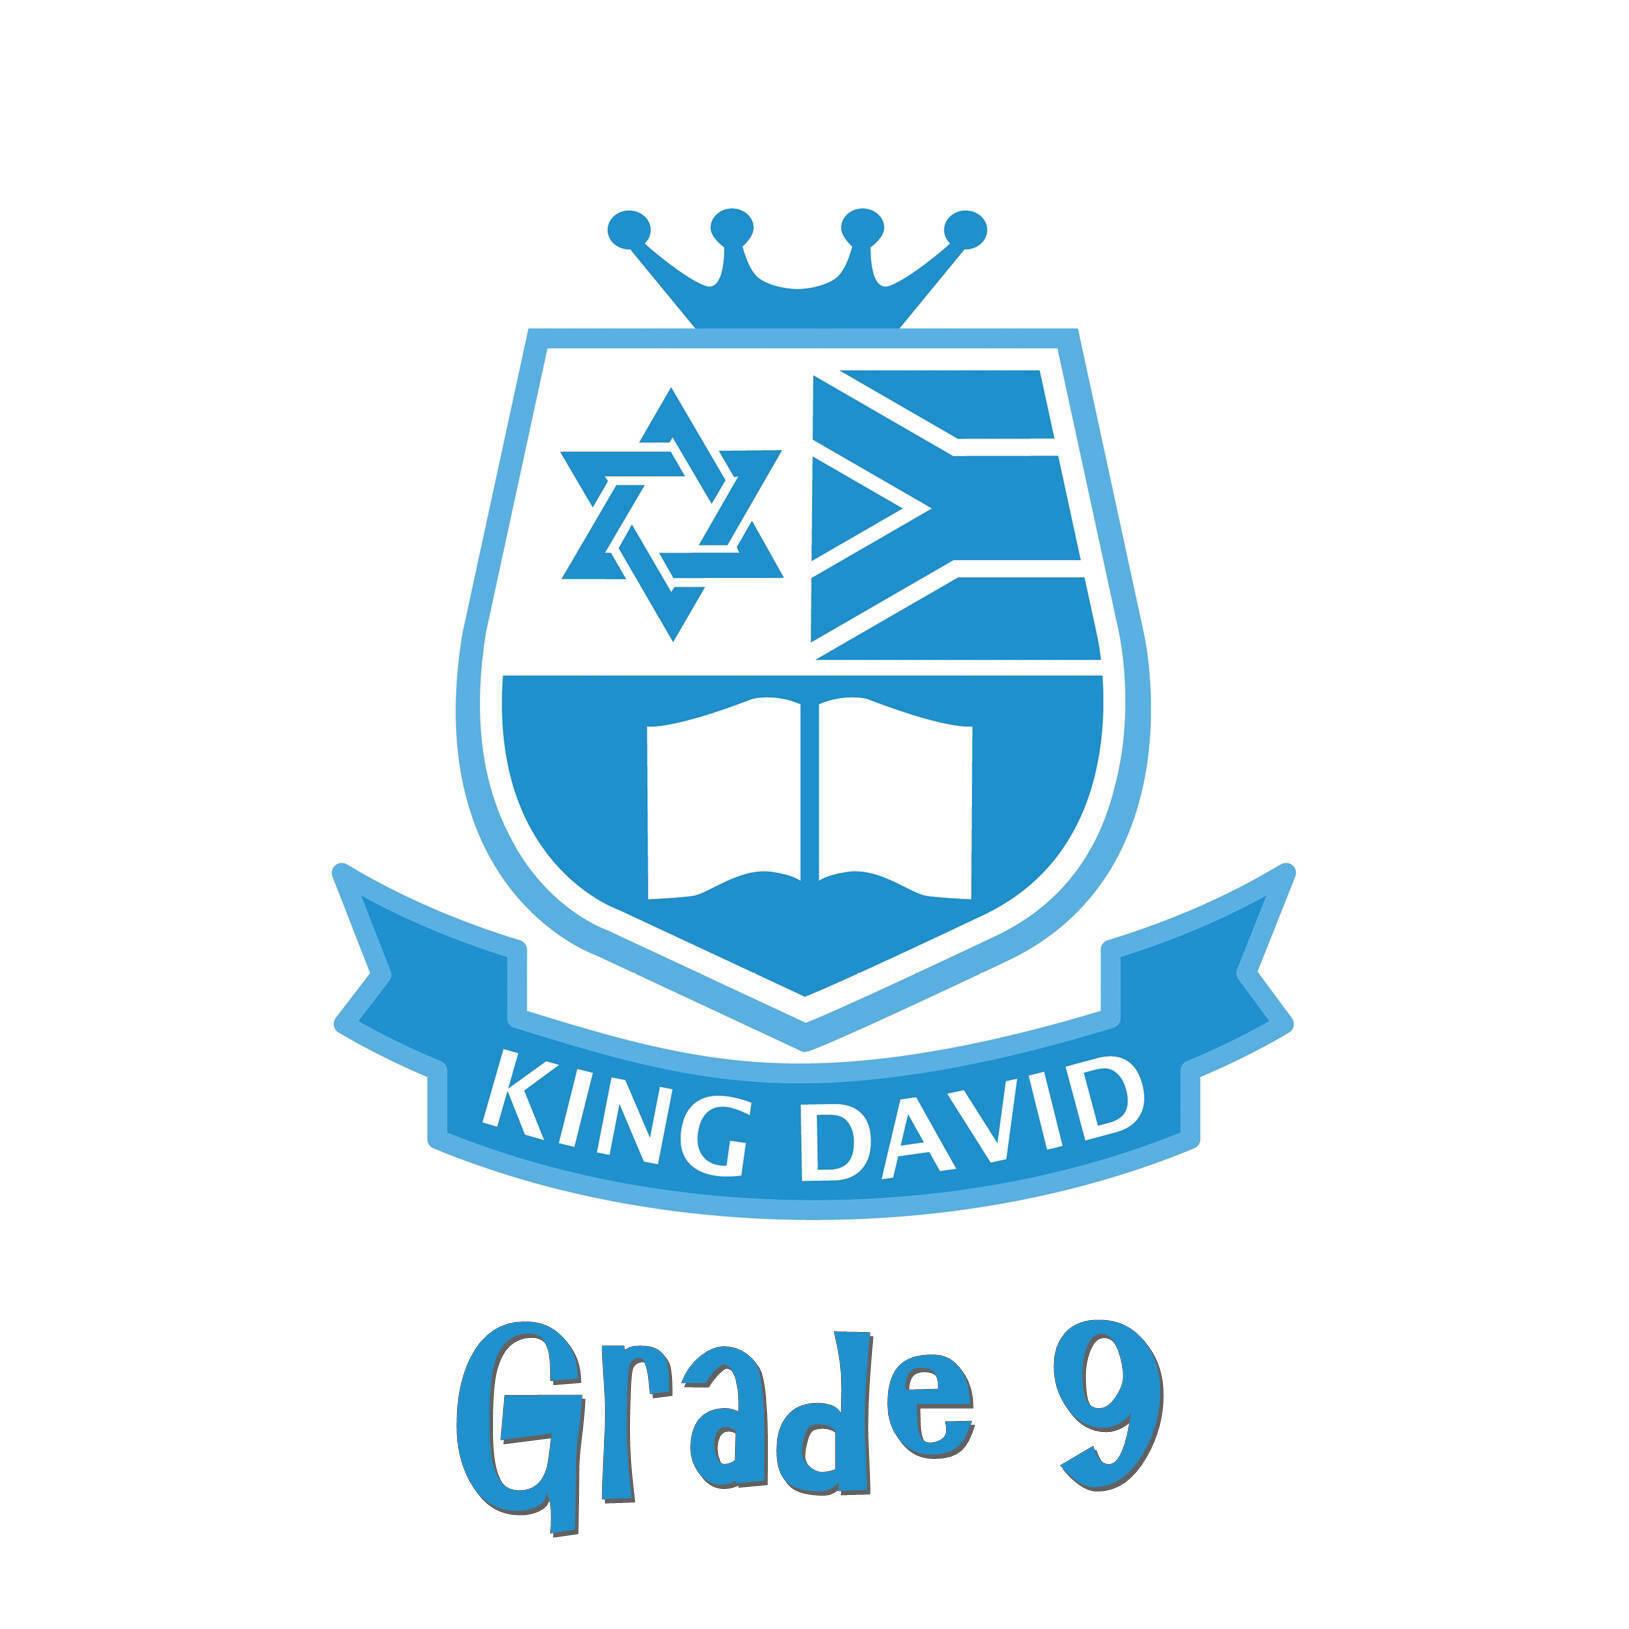 King David Victory Park Grade 9